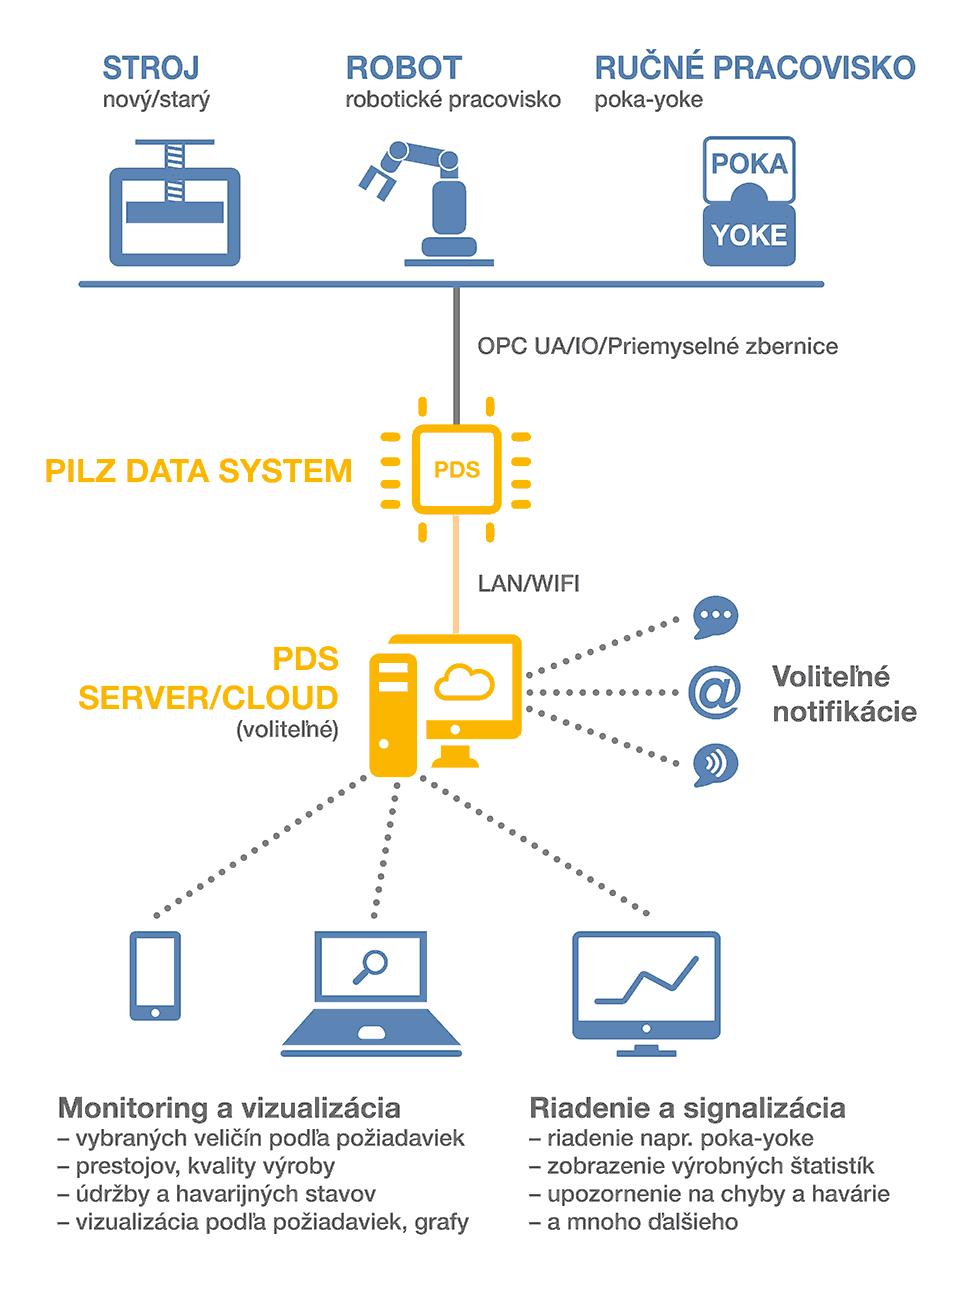 Ako PILZ DATA SYSTEM funguje